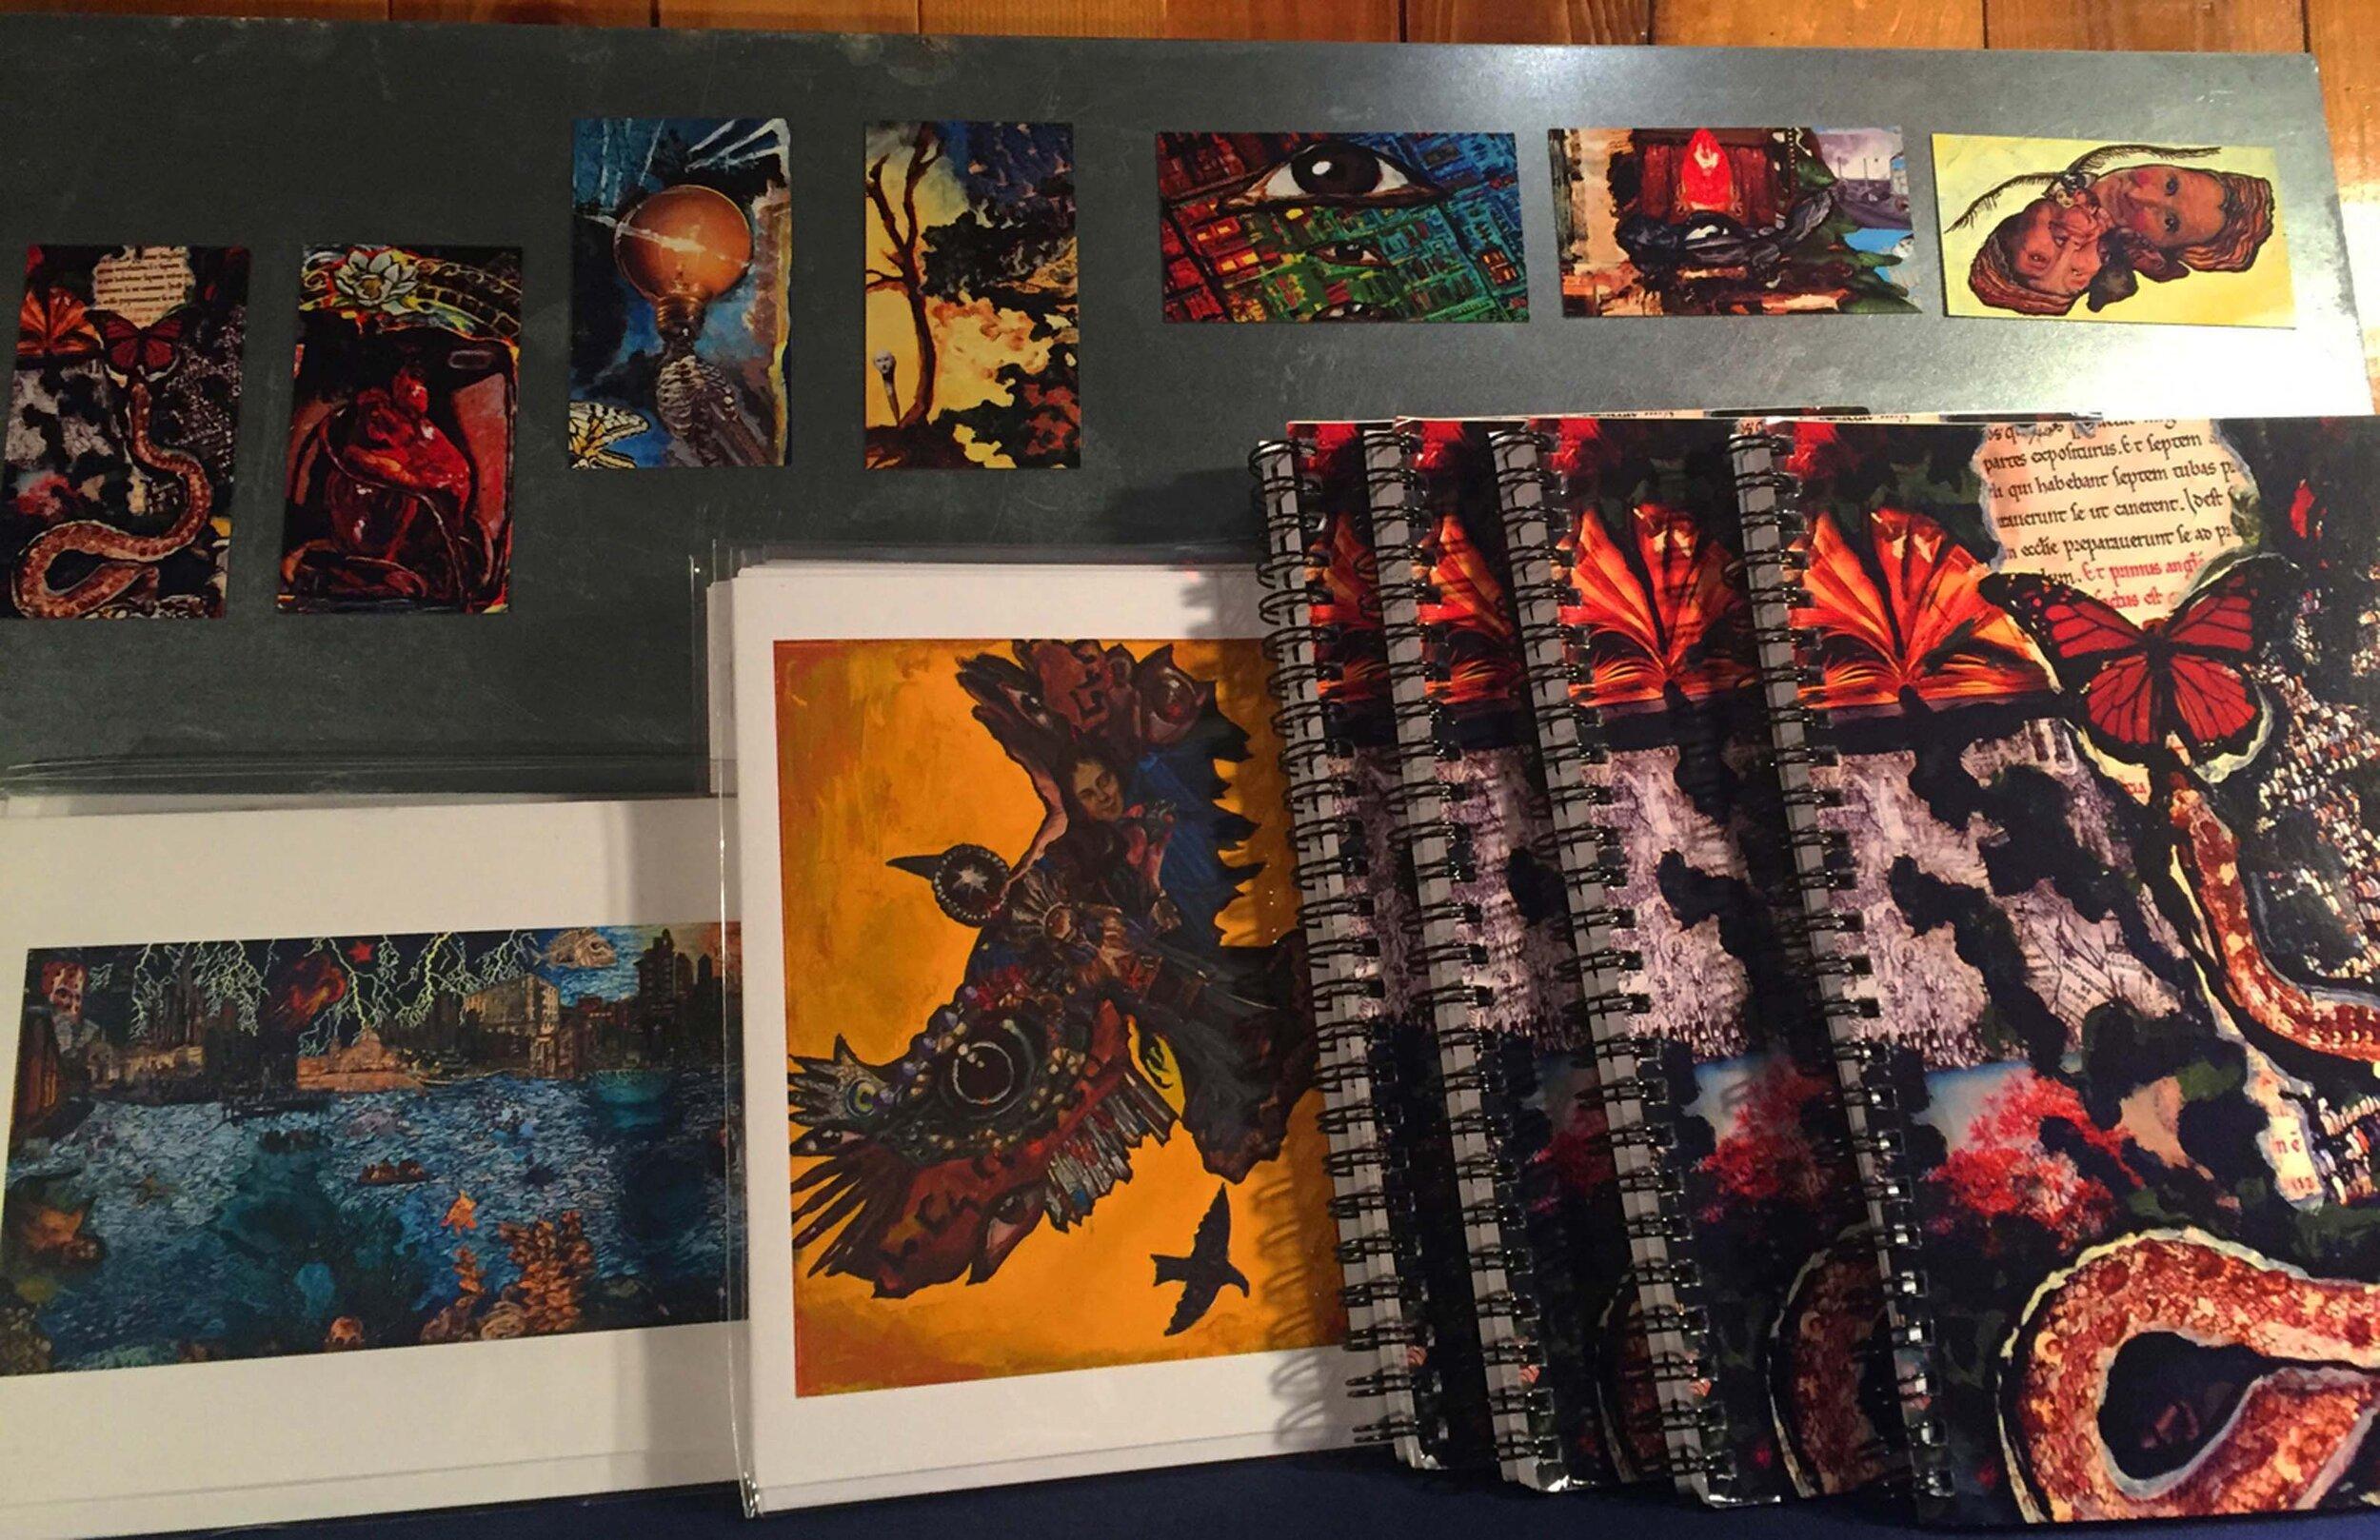 emclaughlin_magnets cards journals.jpg